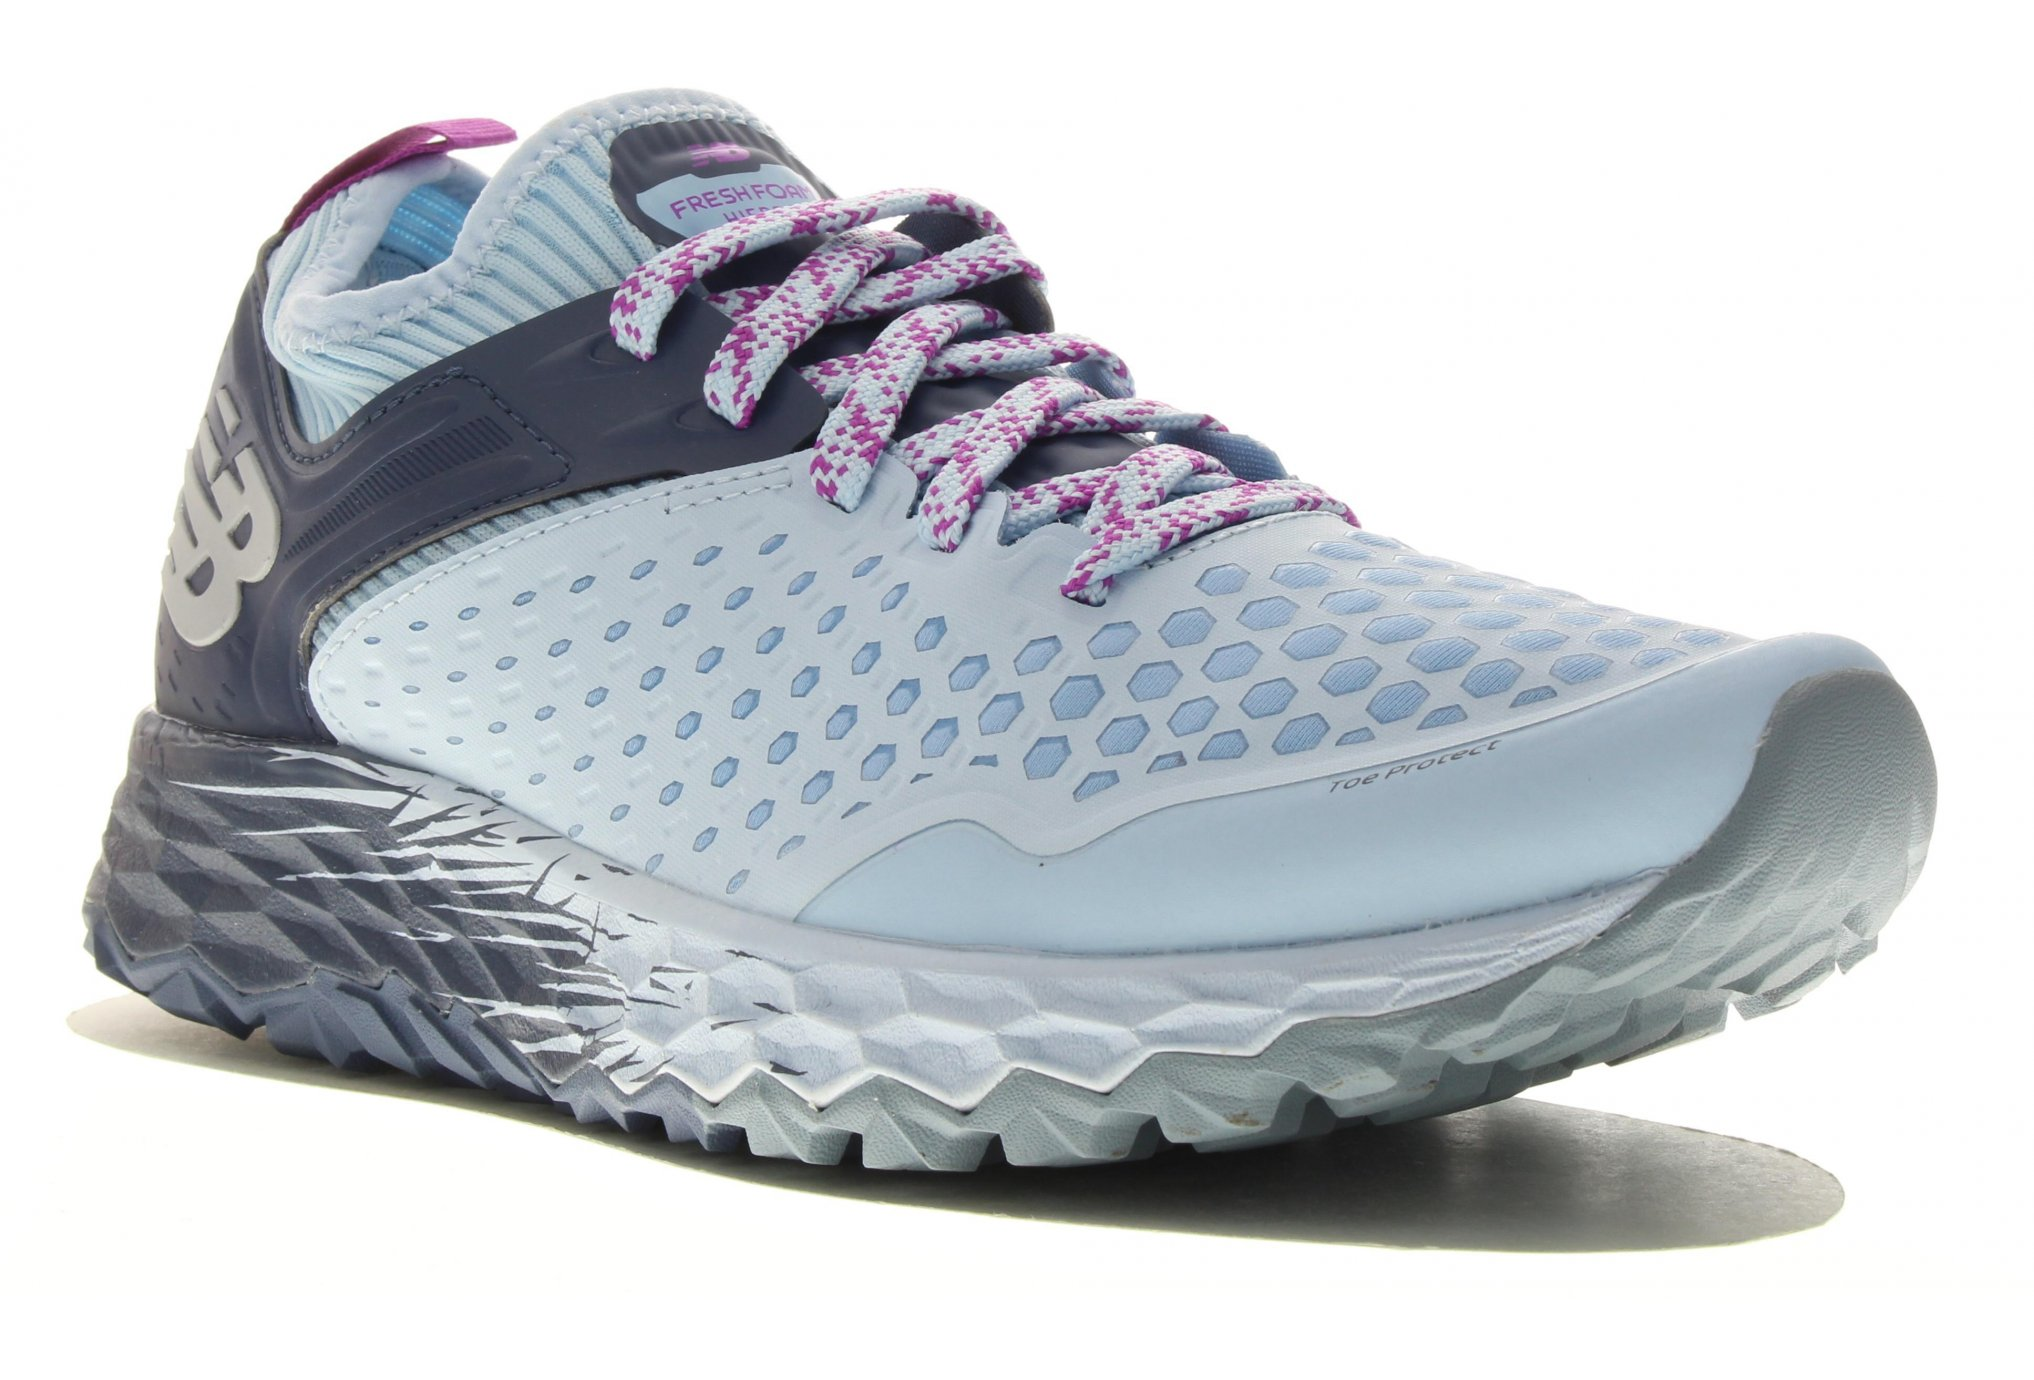 New Balance Fresh Foam Hierro V4 W Chaussures running femme